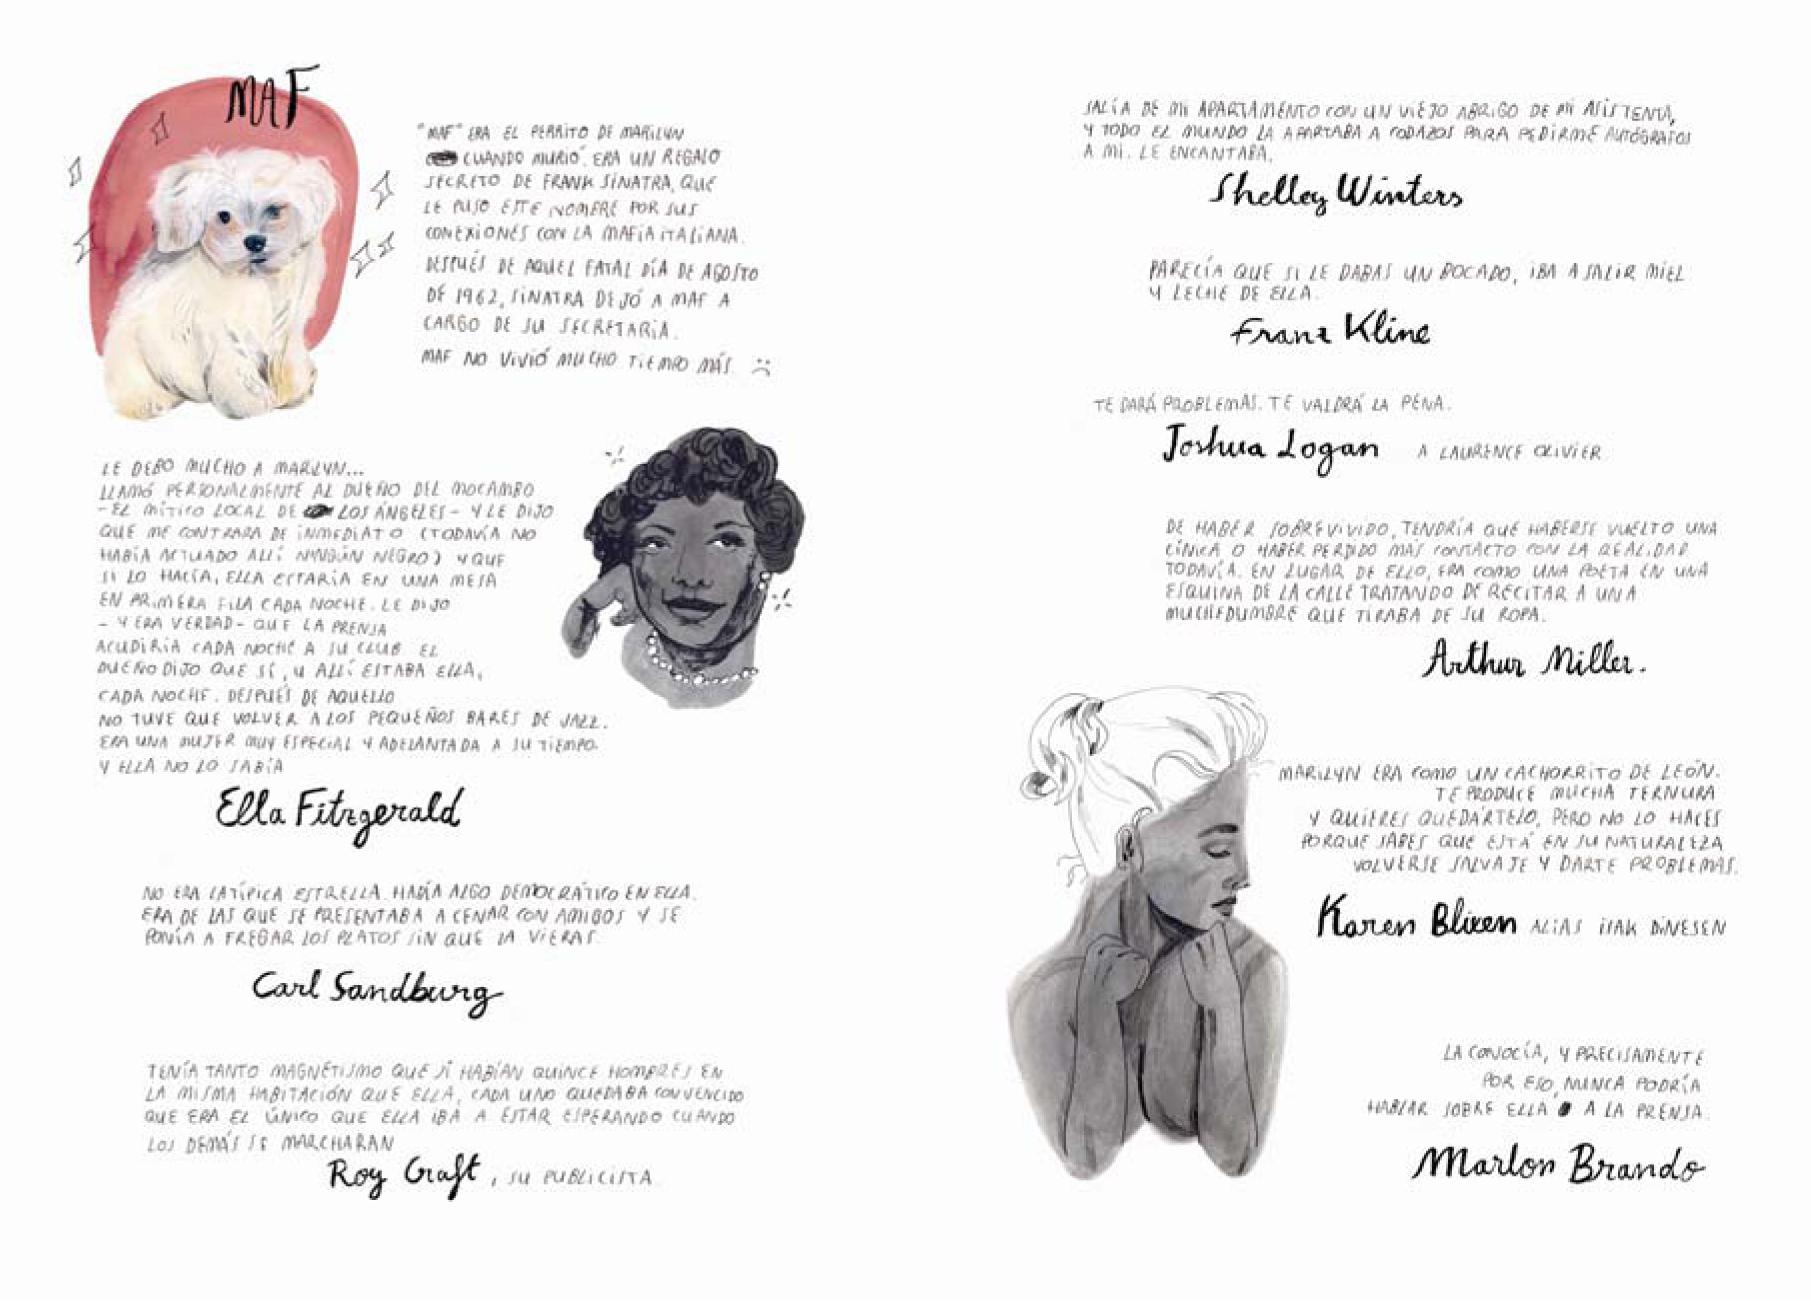 Pagina 100 con dedicada a Marilyn donde figura Maf.